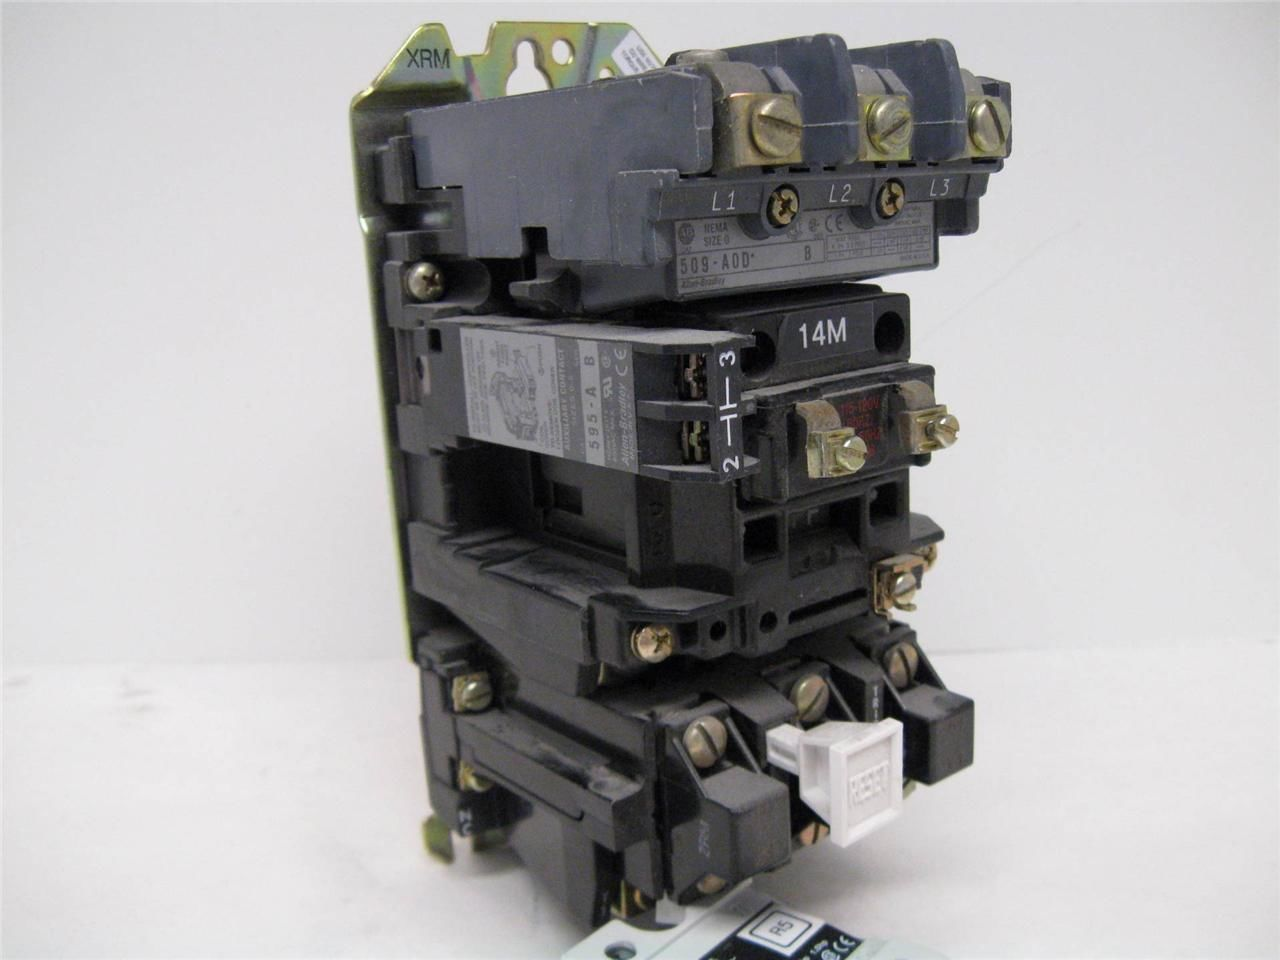 Allen bradley 509 a0d size 0 motor starter 120 vac coil for Allen bradley motor overload